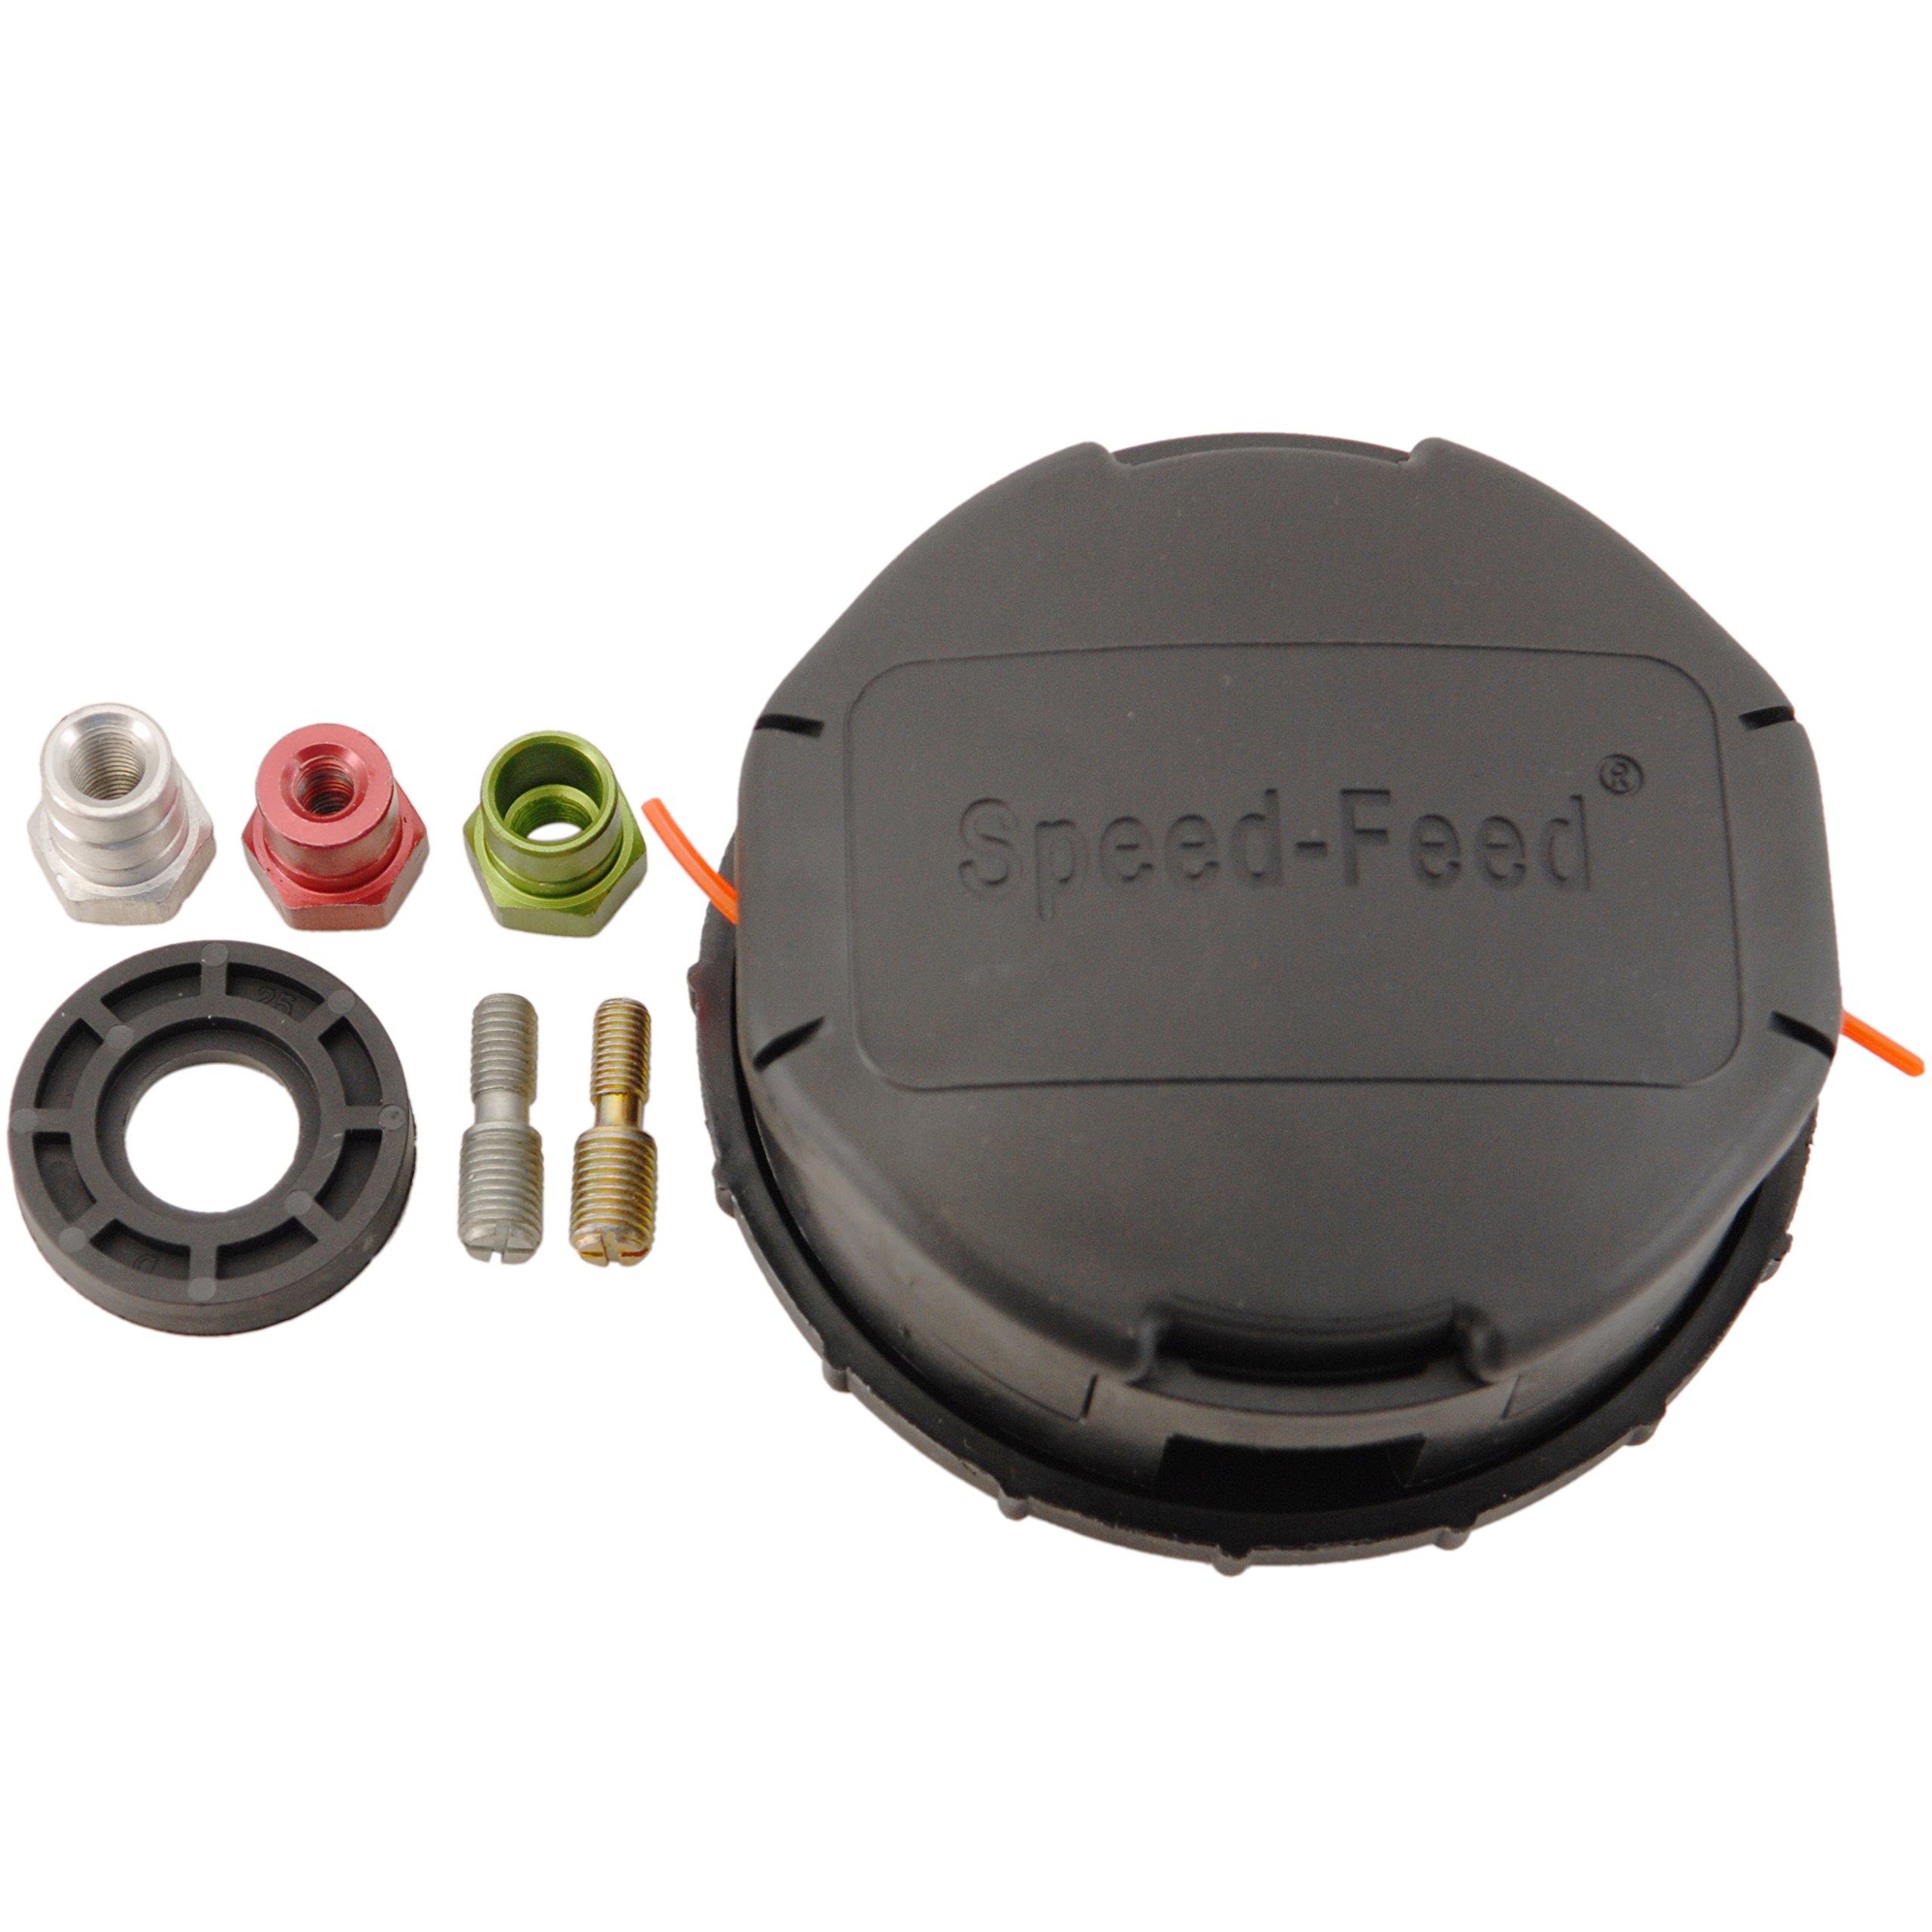 Echo 78890-21001E High Capacity Speed Feed 450 Trimmer Head